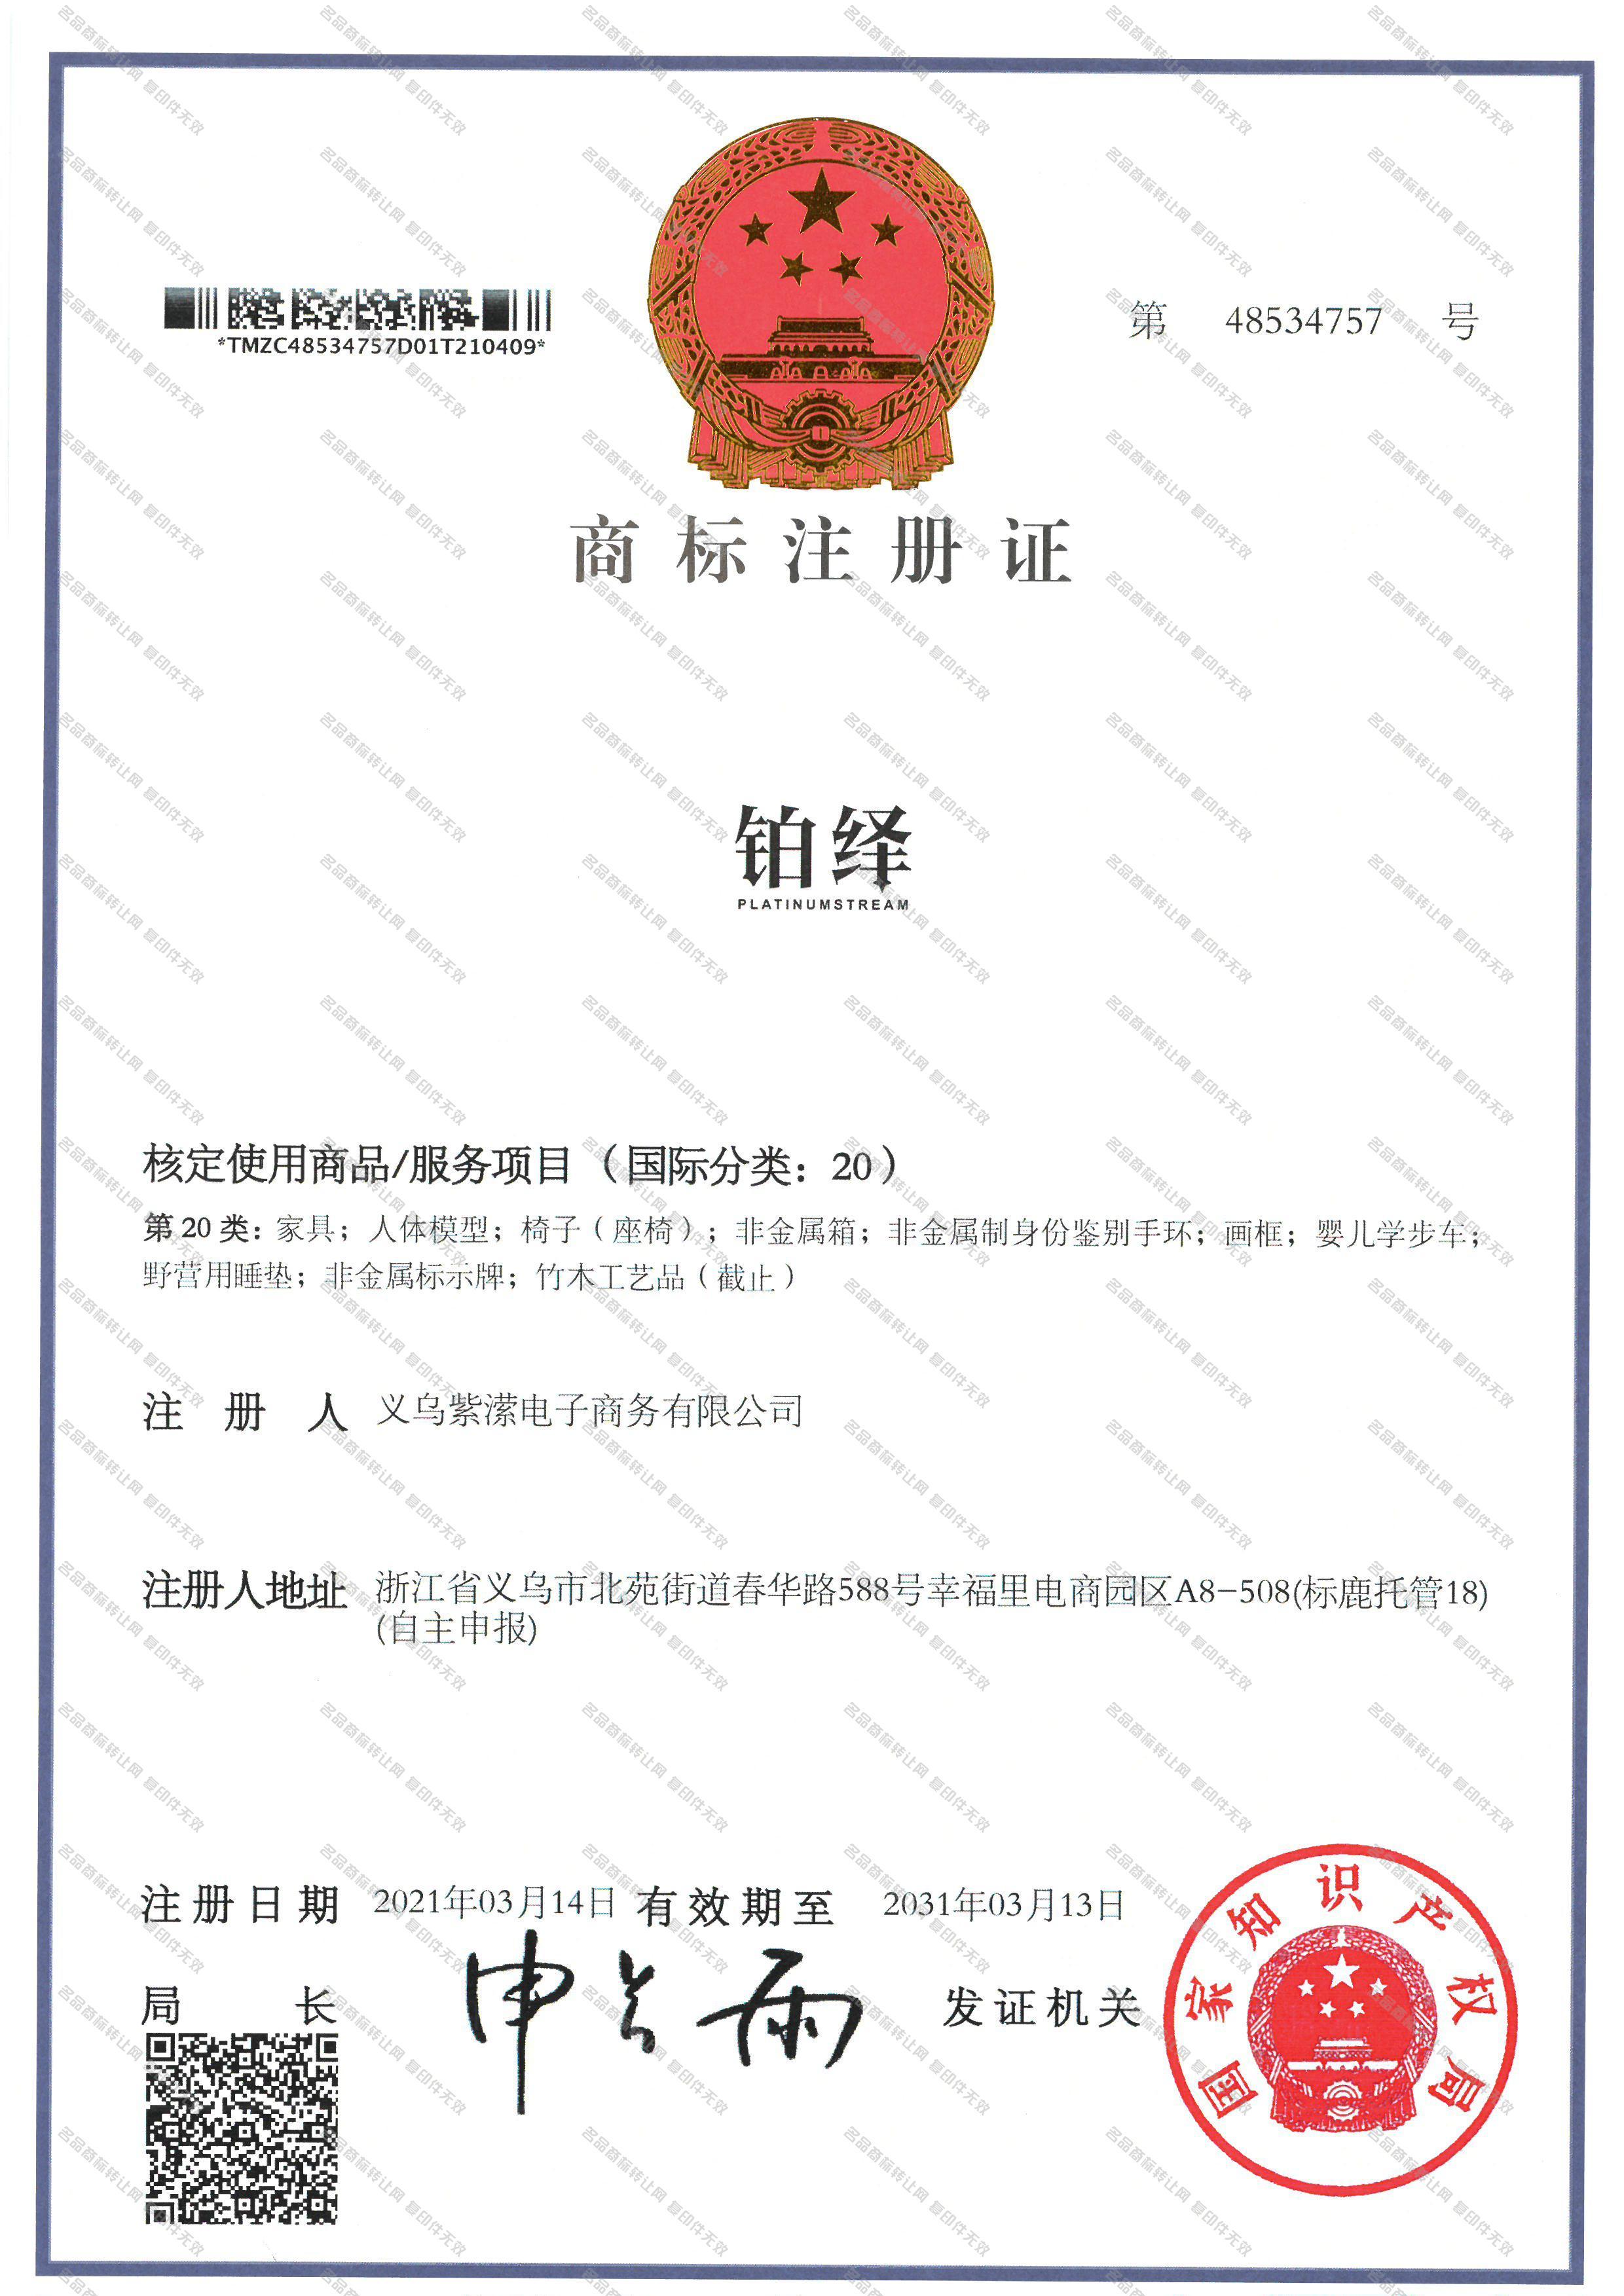 铂绎 PLATINUMSTREAM;PLATINUM STREAM注册证